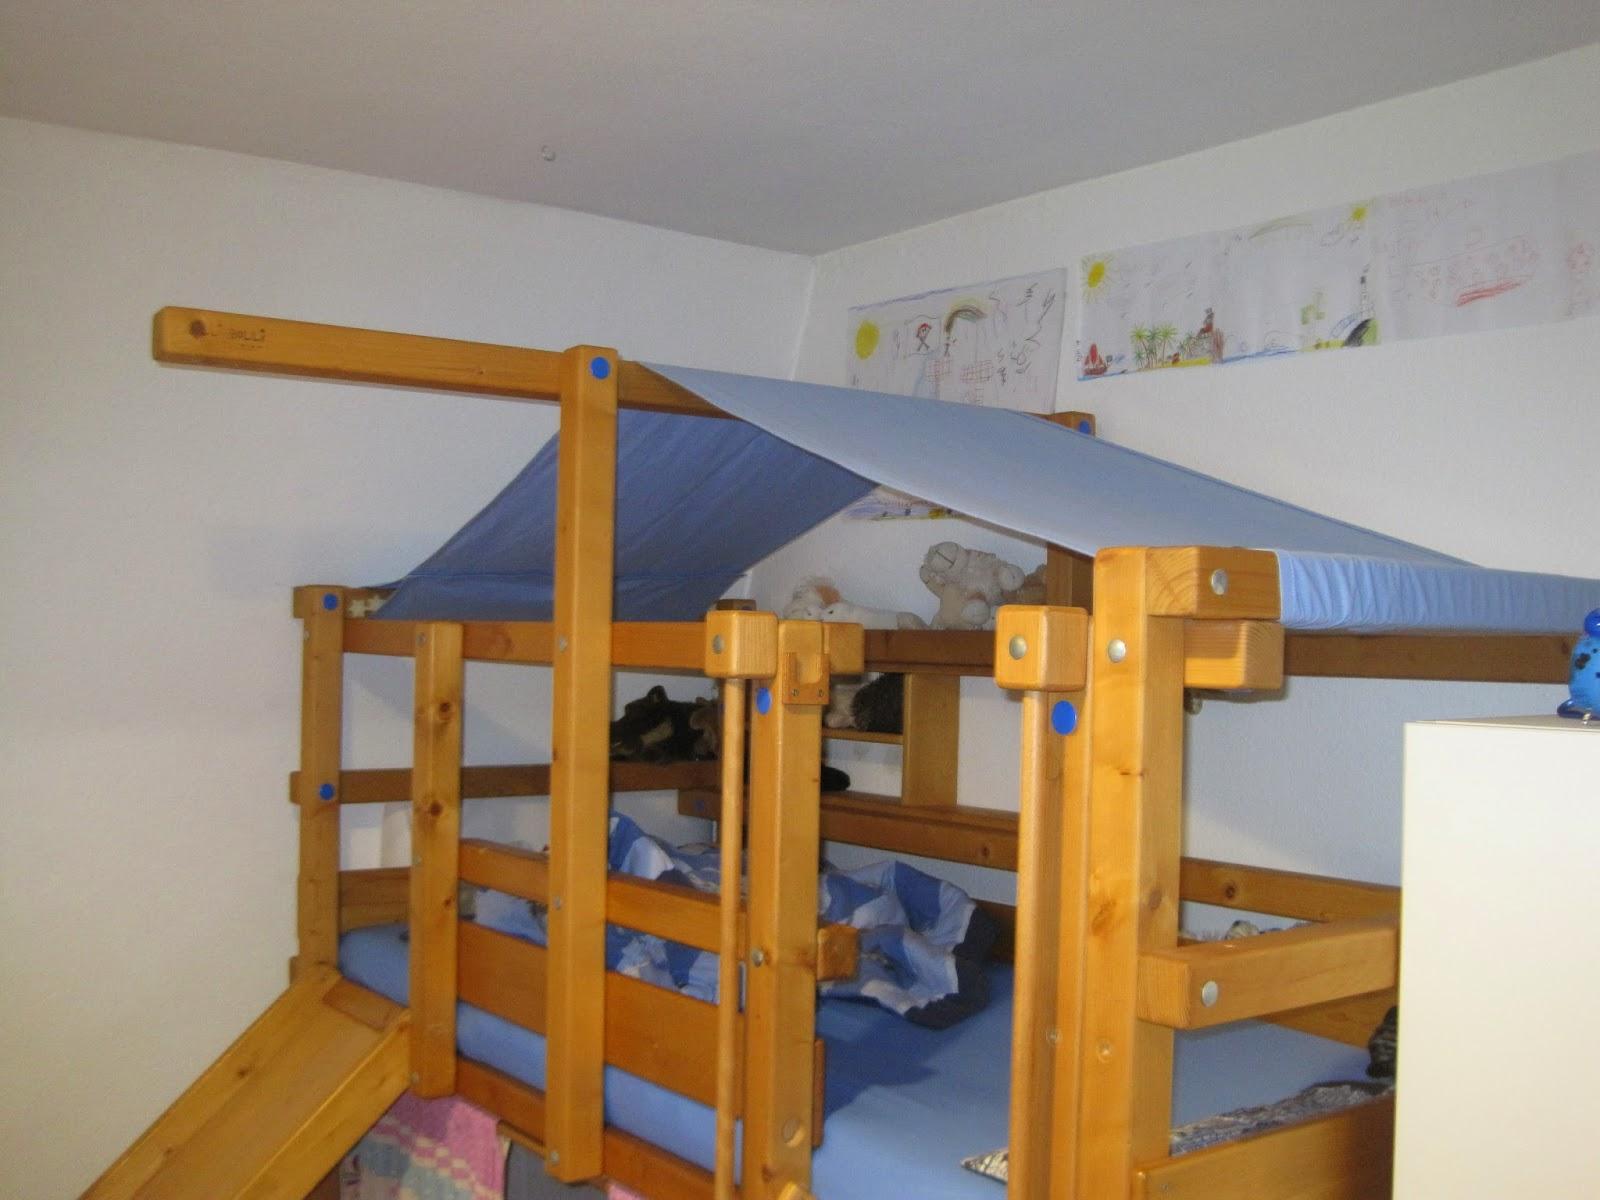 fadenland dach f rs billi bolli hochbett. Black Bedroom Furniture Sets. Home Design Ideas